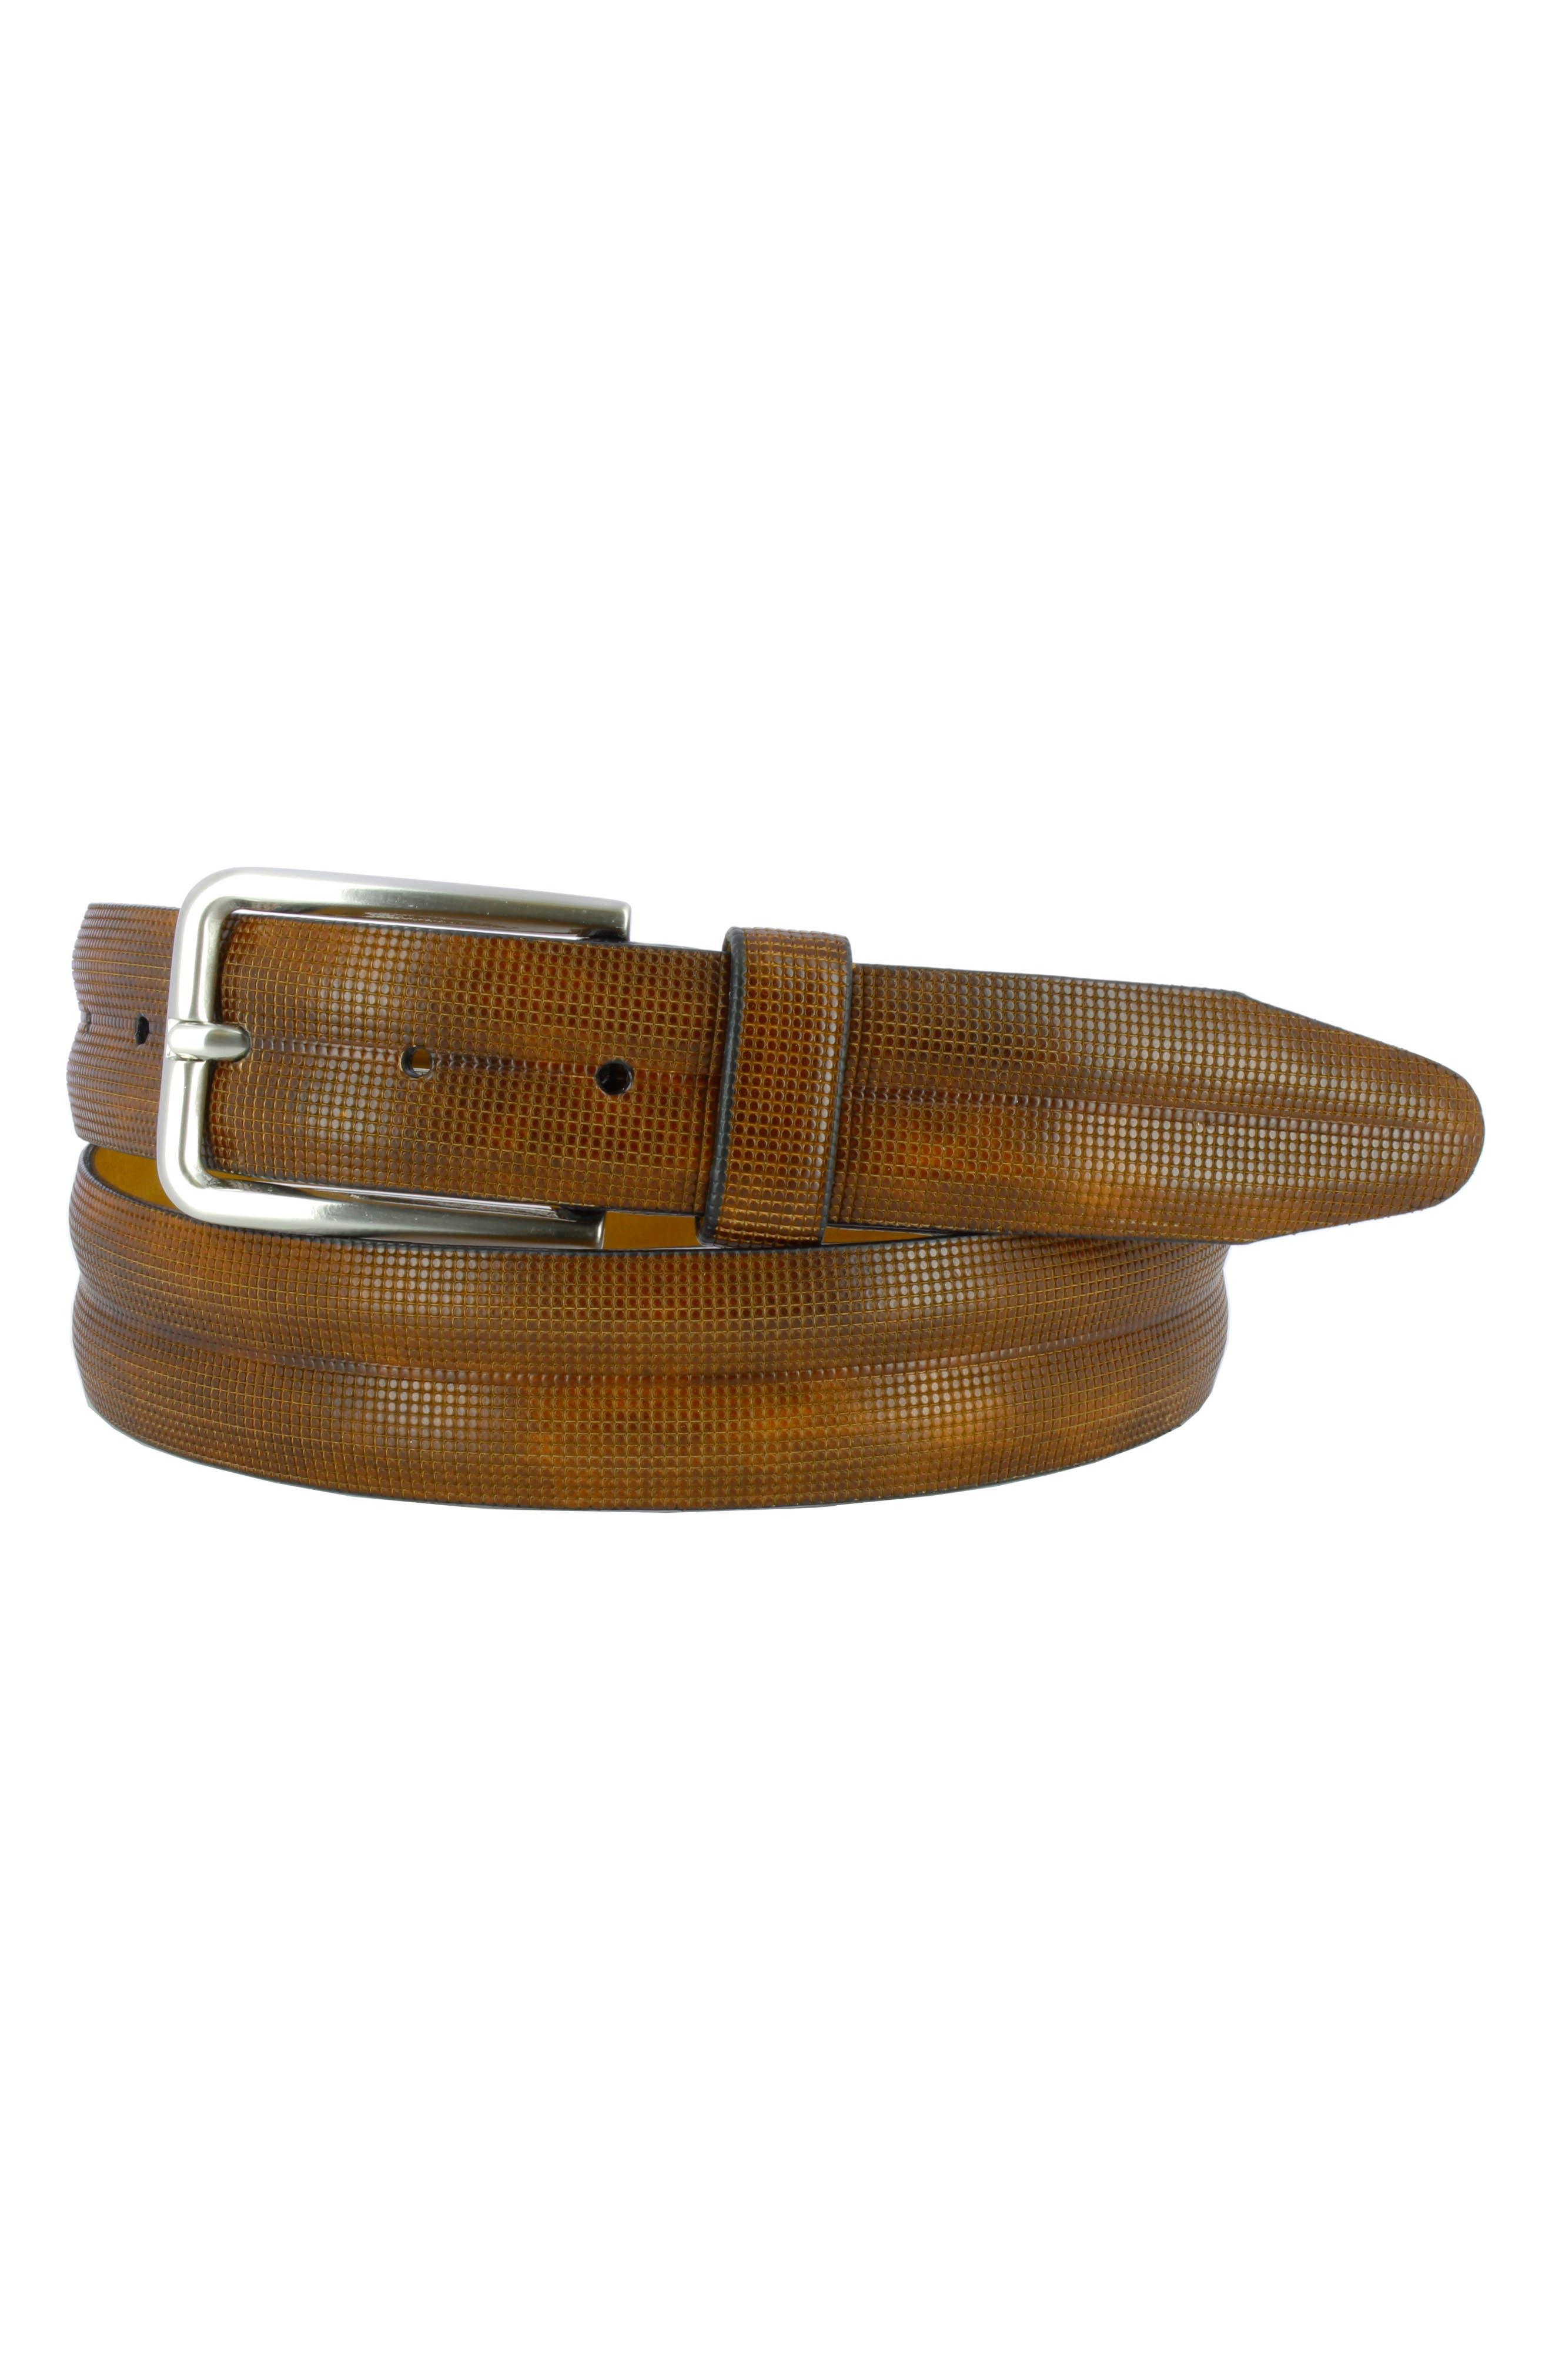 Remo Tulliani Jerrell Embossed Leather Belt